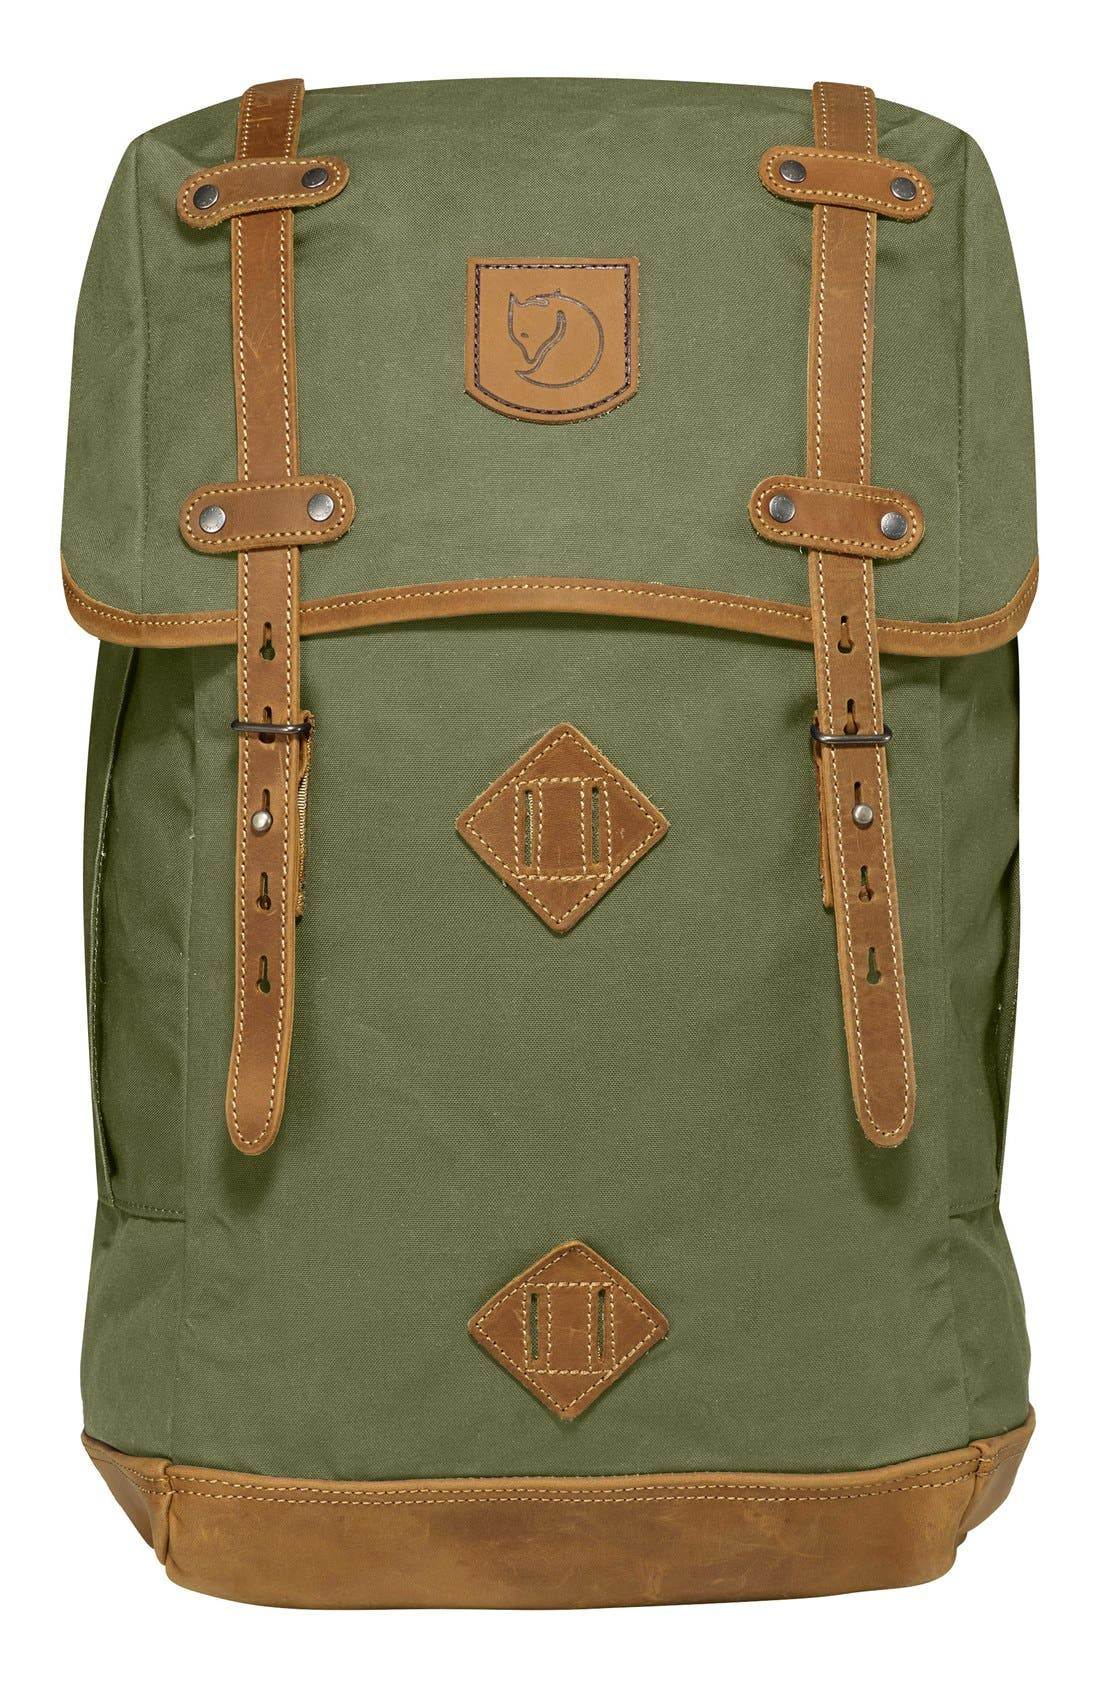 Fjällräven 'Rucksack No. 21' Large Backpack